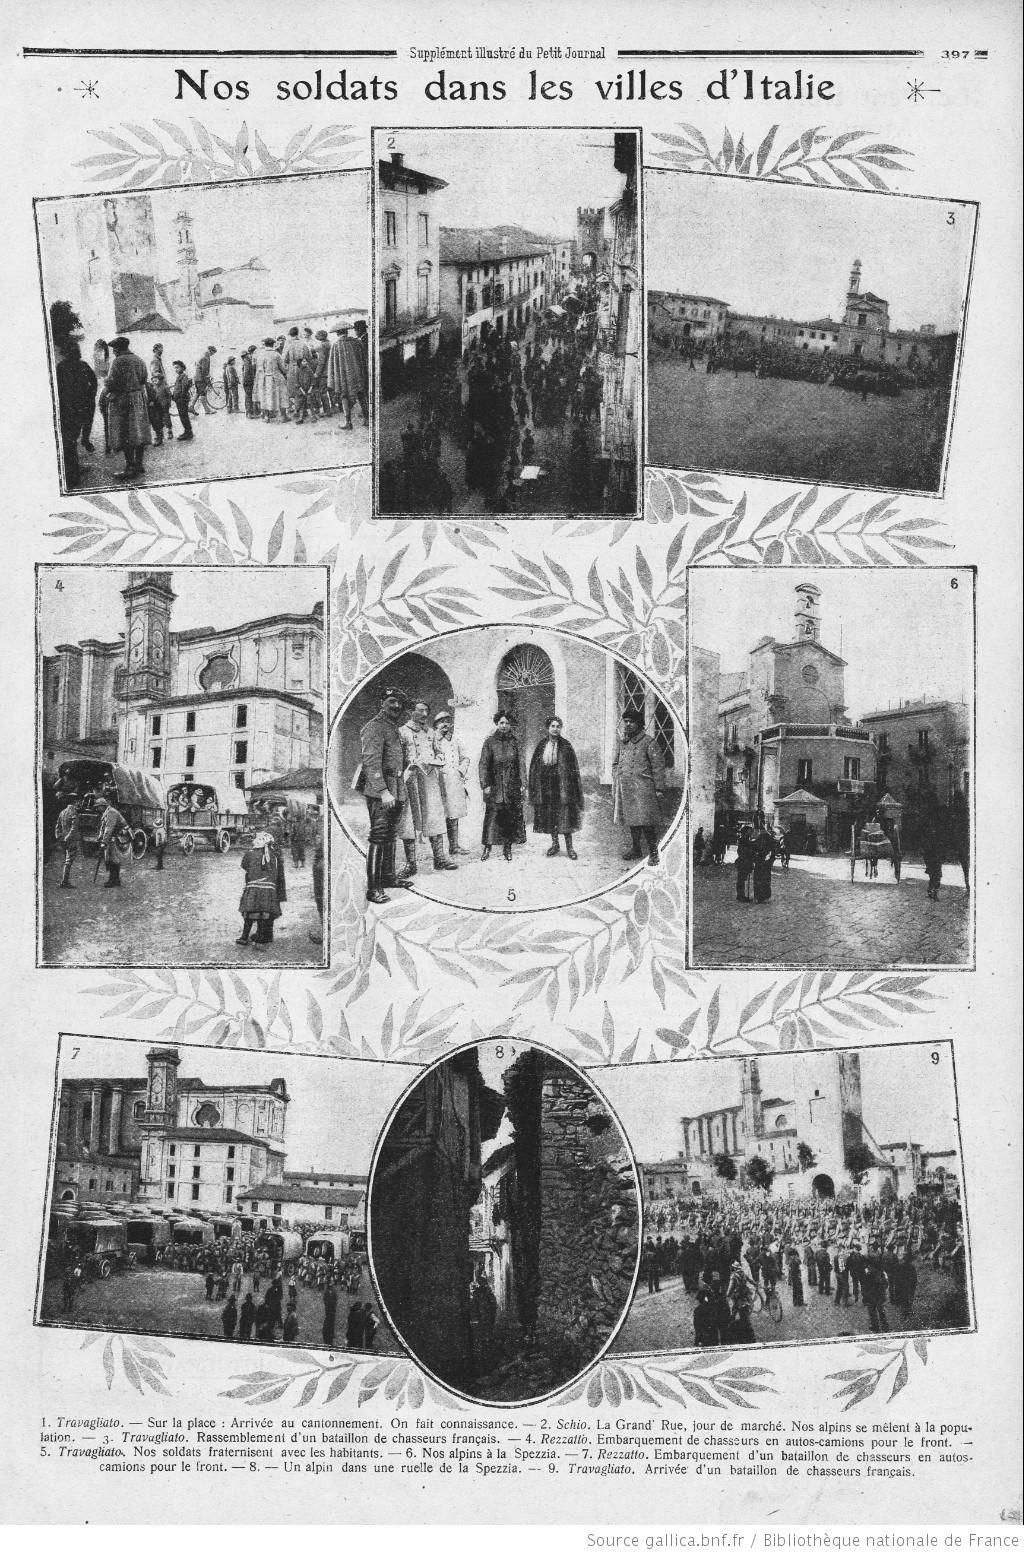 LPJ Illustre 1917-12-16 C.jpg